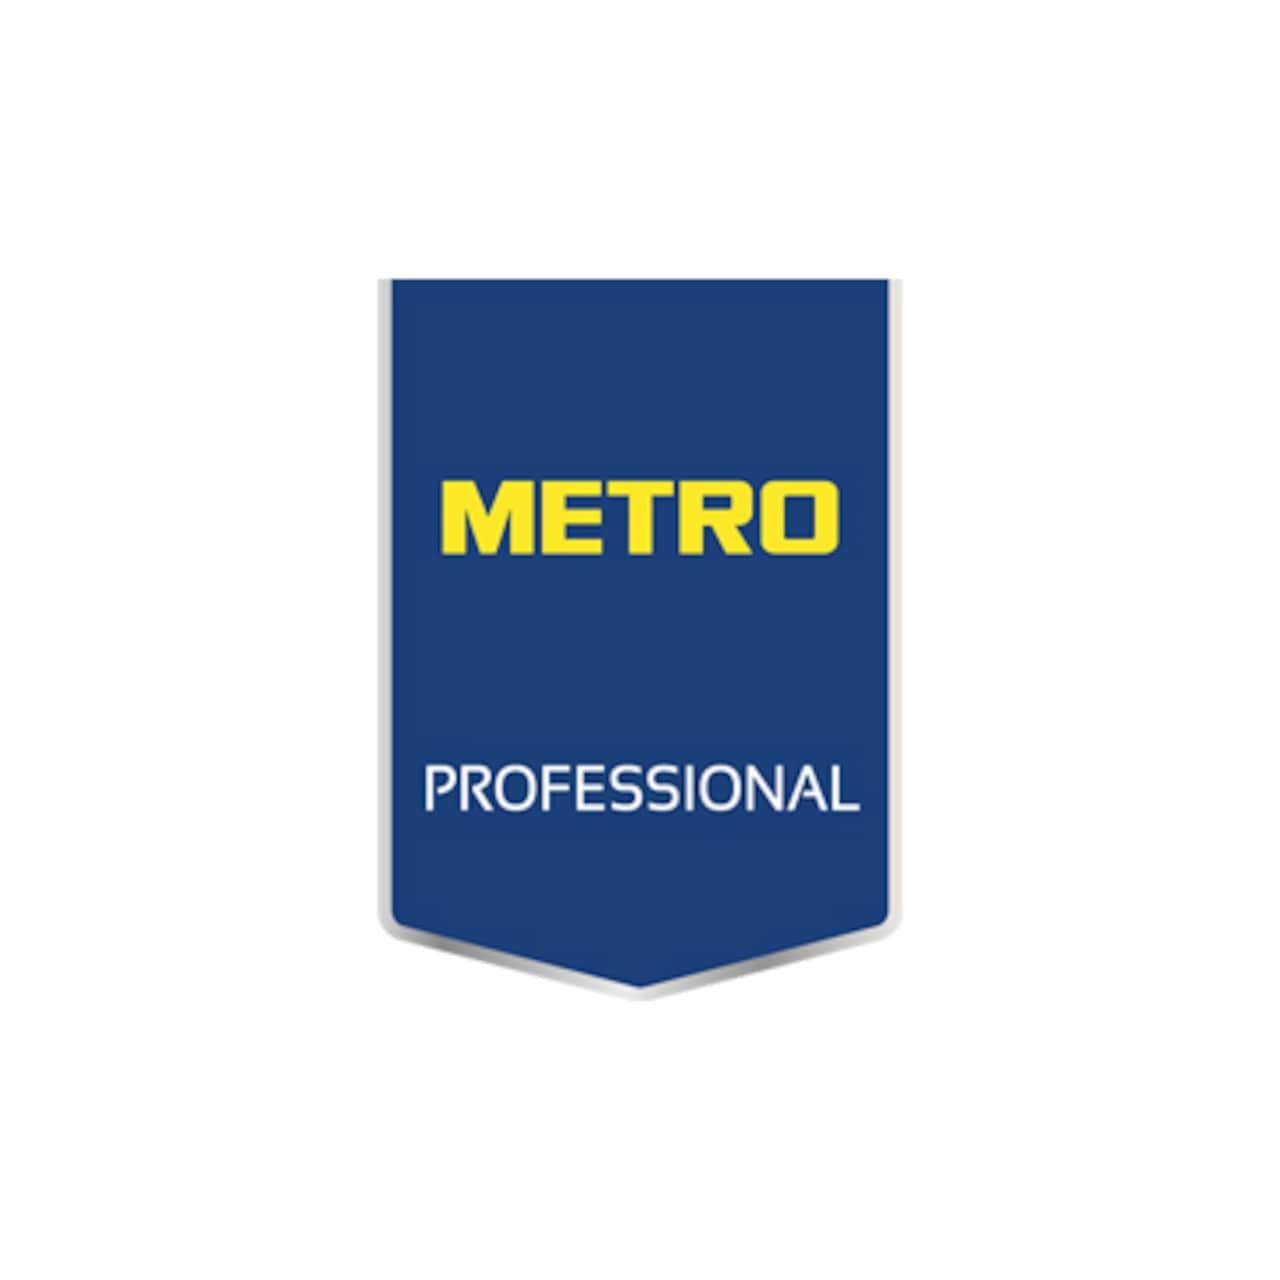 metro professional logo